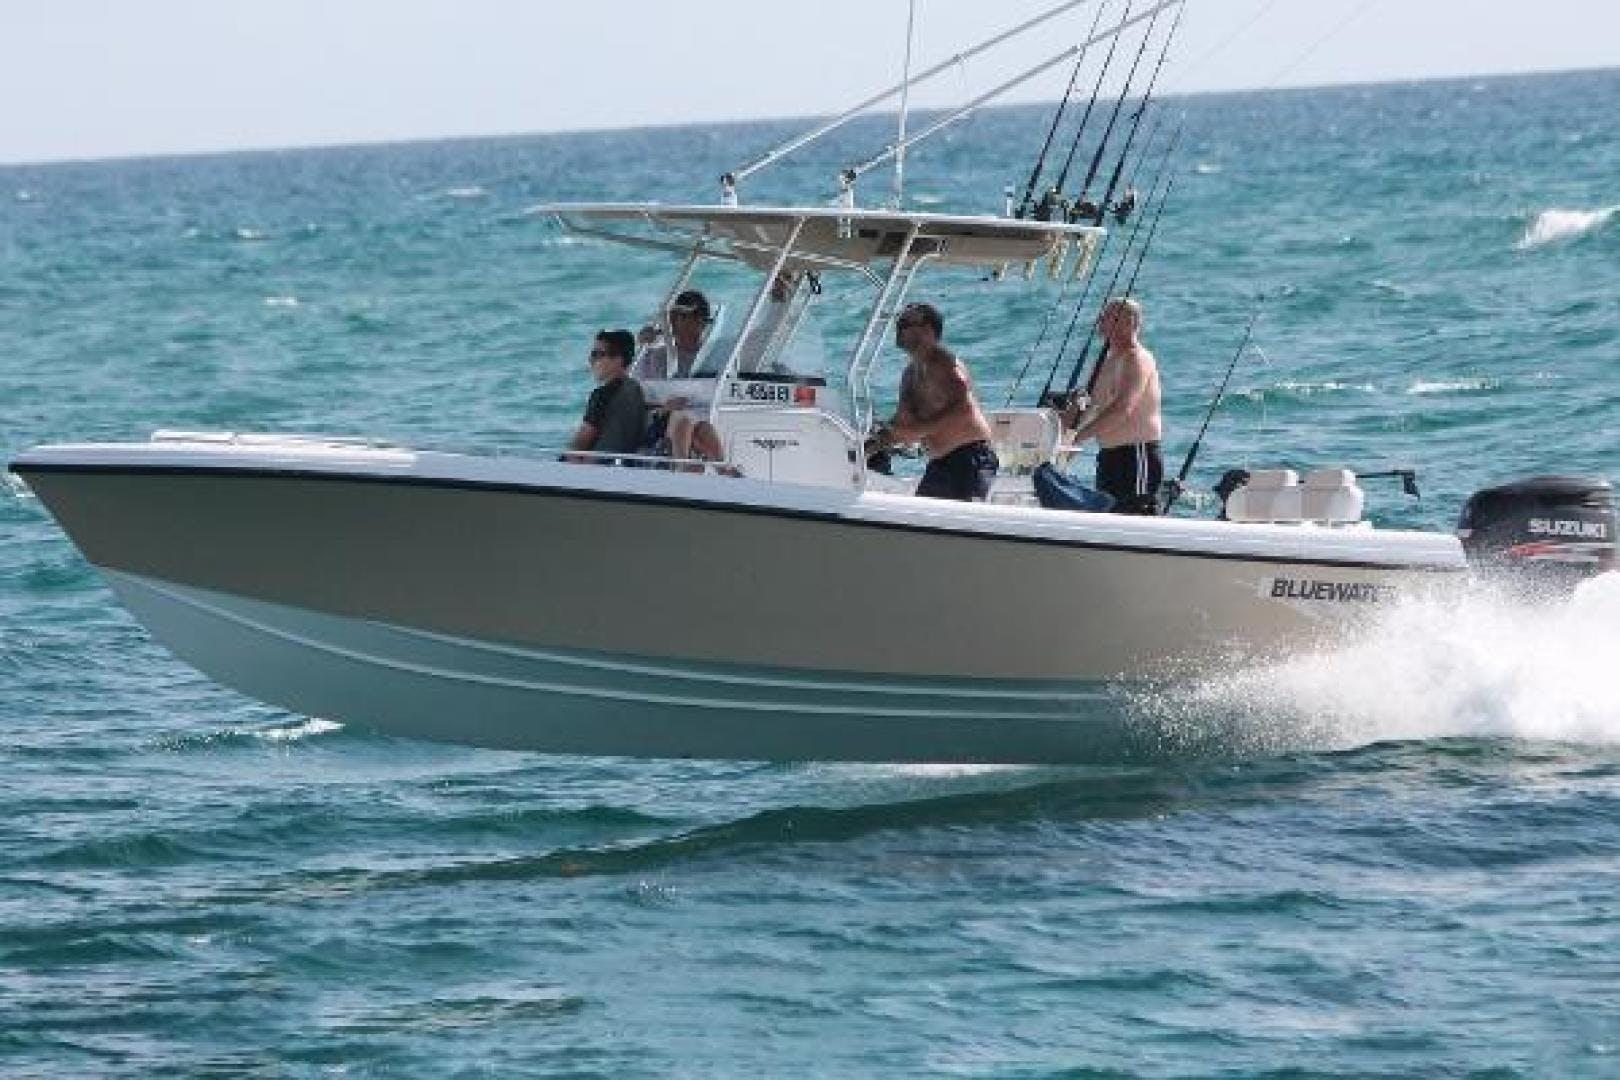 2020 Bluewater Sportfishing 24' 2550 Bluewater Sportfishing 2550 | Picture 2 of 13